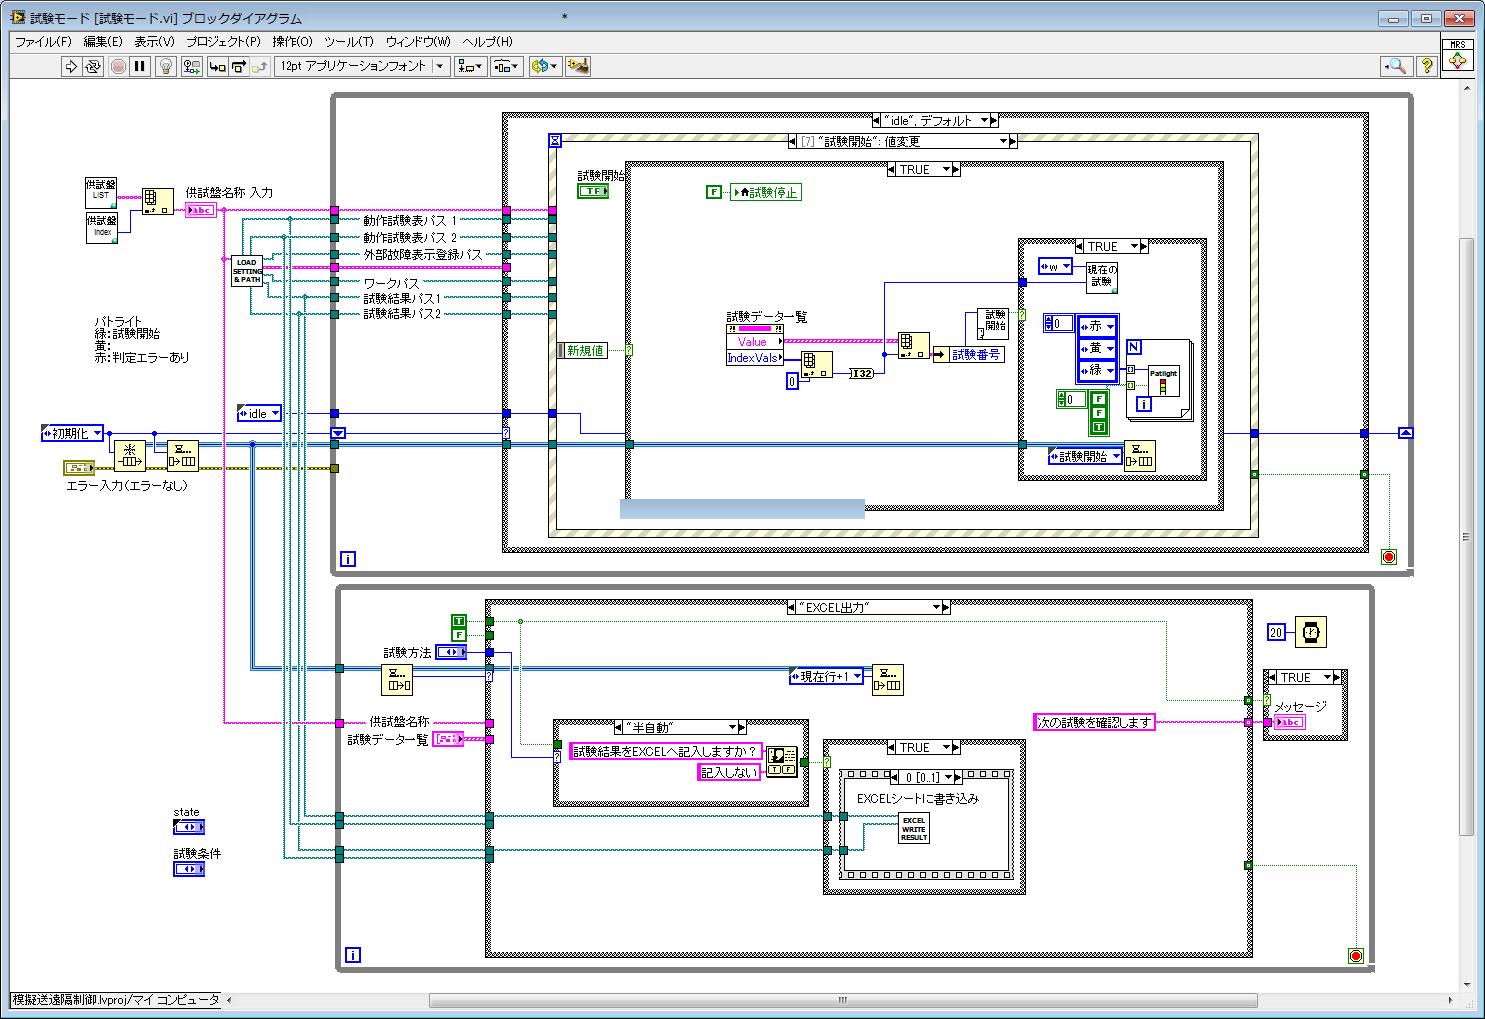 Business Solutionservicesiida Electronics Coltd Block Diagram Excel